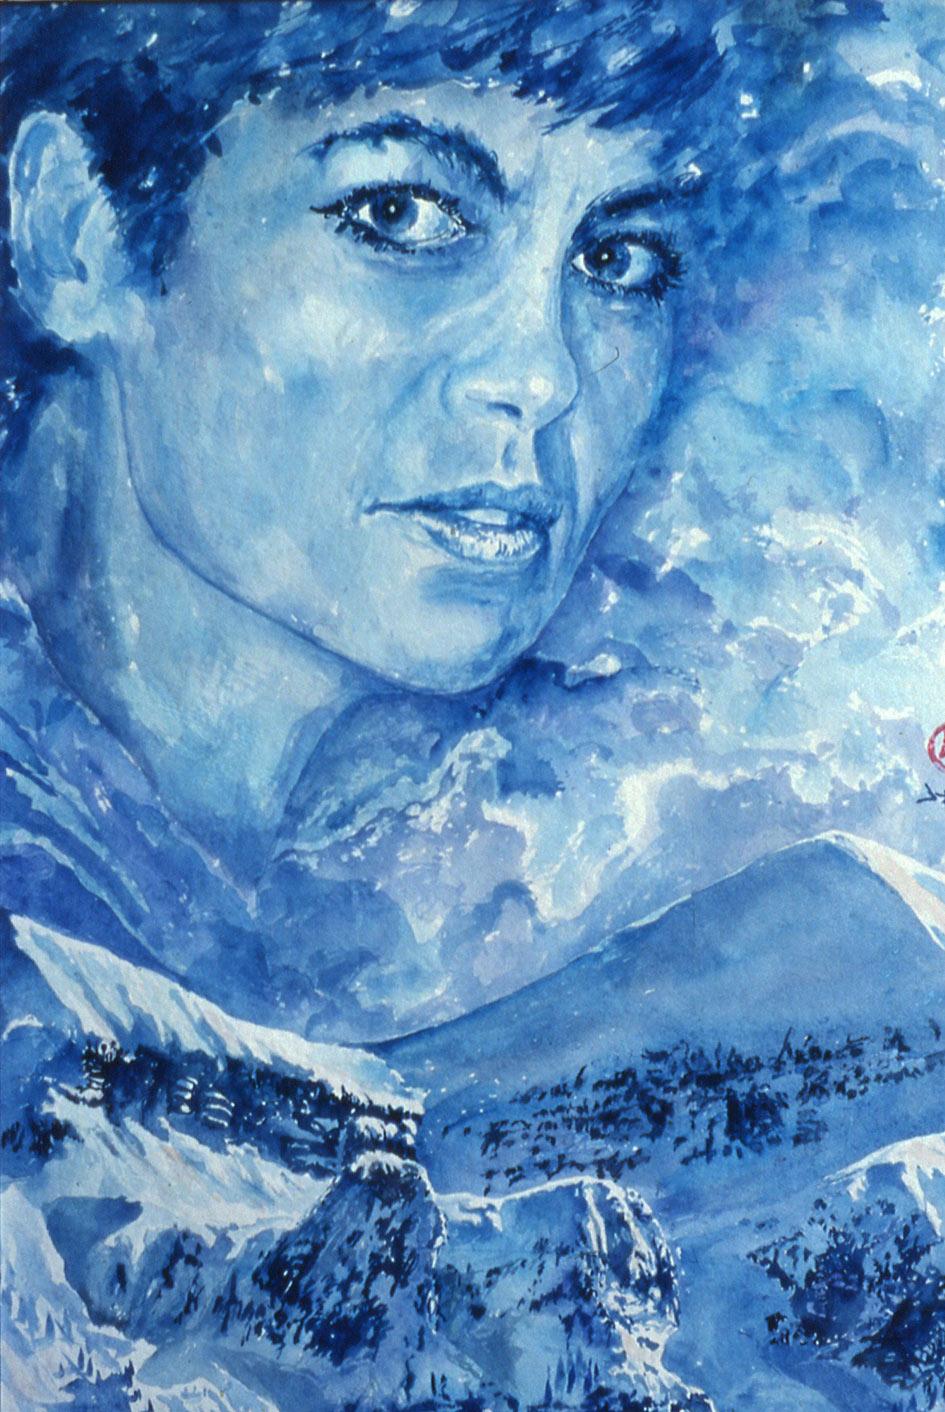 am i blue Lyrics to 'am i blue' by billie holiday harry akst / grant clarke / am i blue am i blue / ain't these tears / in these eyes telling you / am i blue you'll.